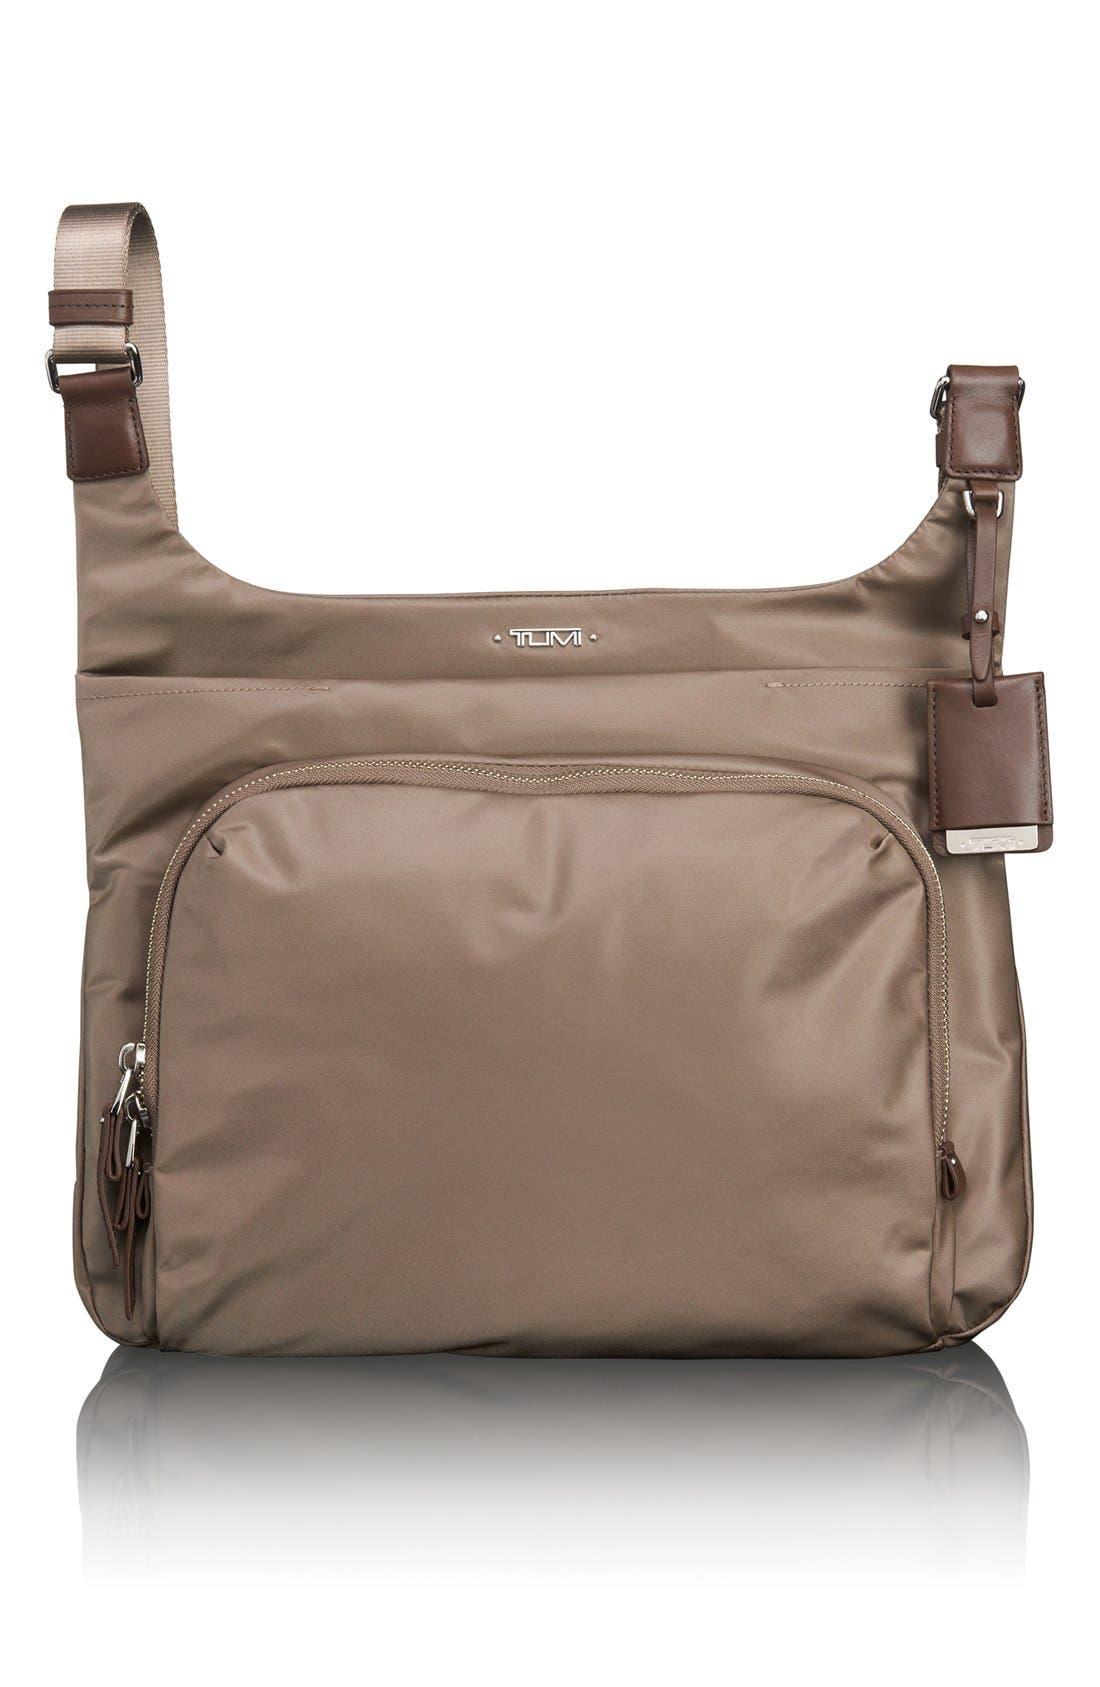 Main Image - Tumi 'Voyager - Sumatra' Crossbody Bag